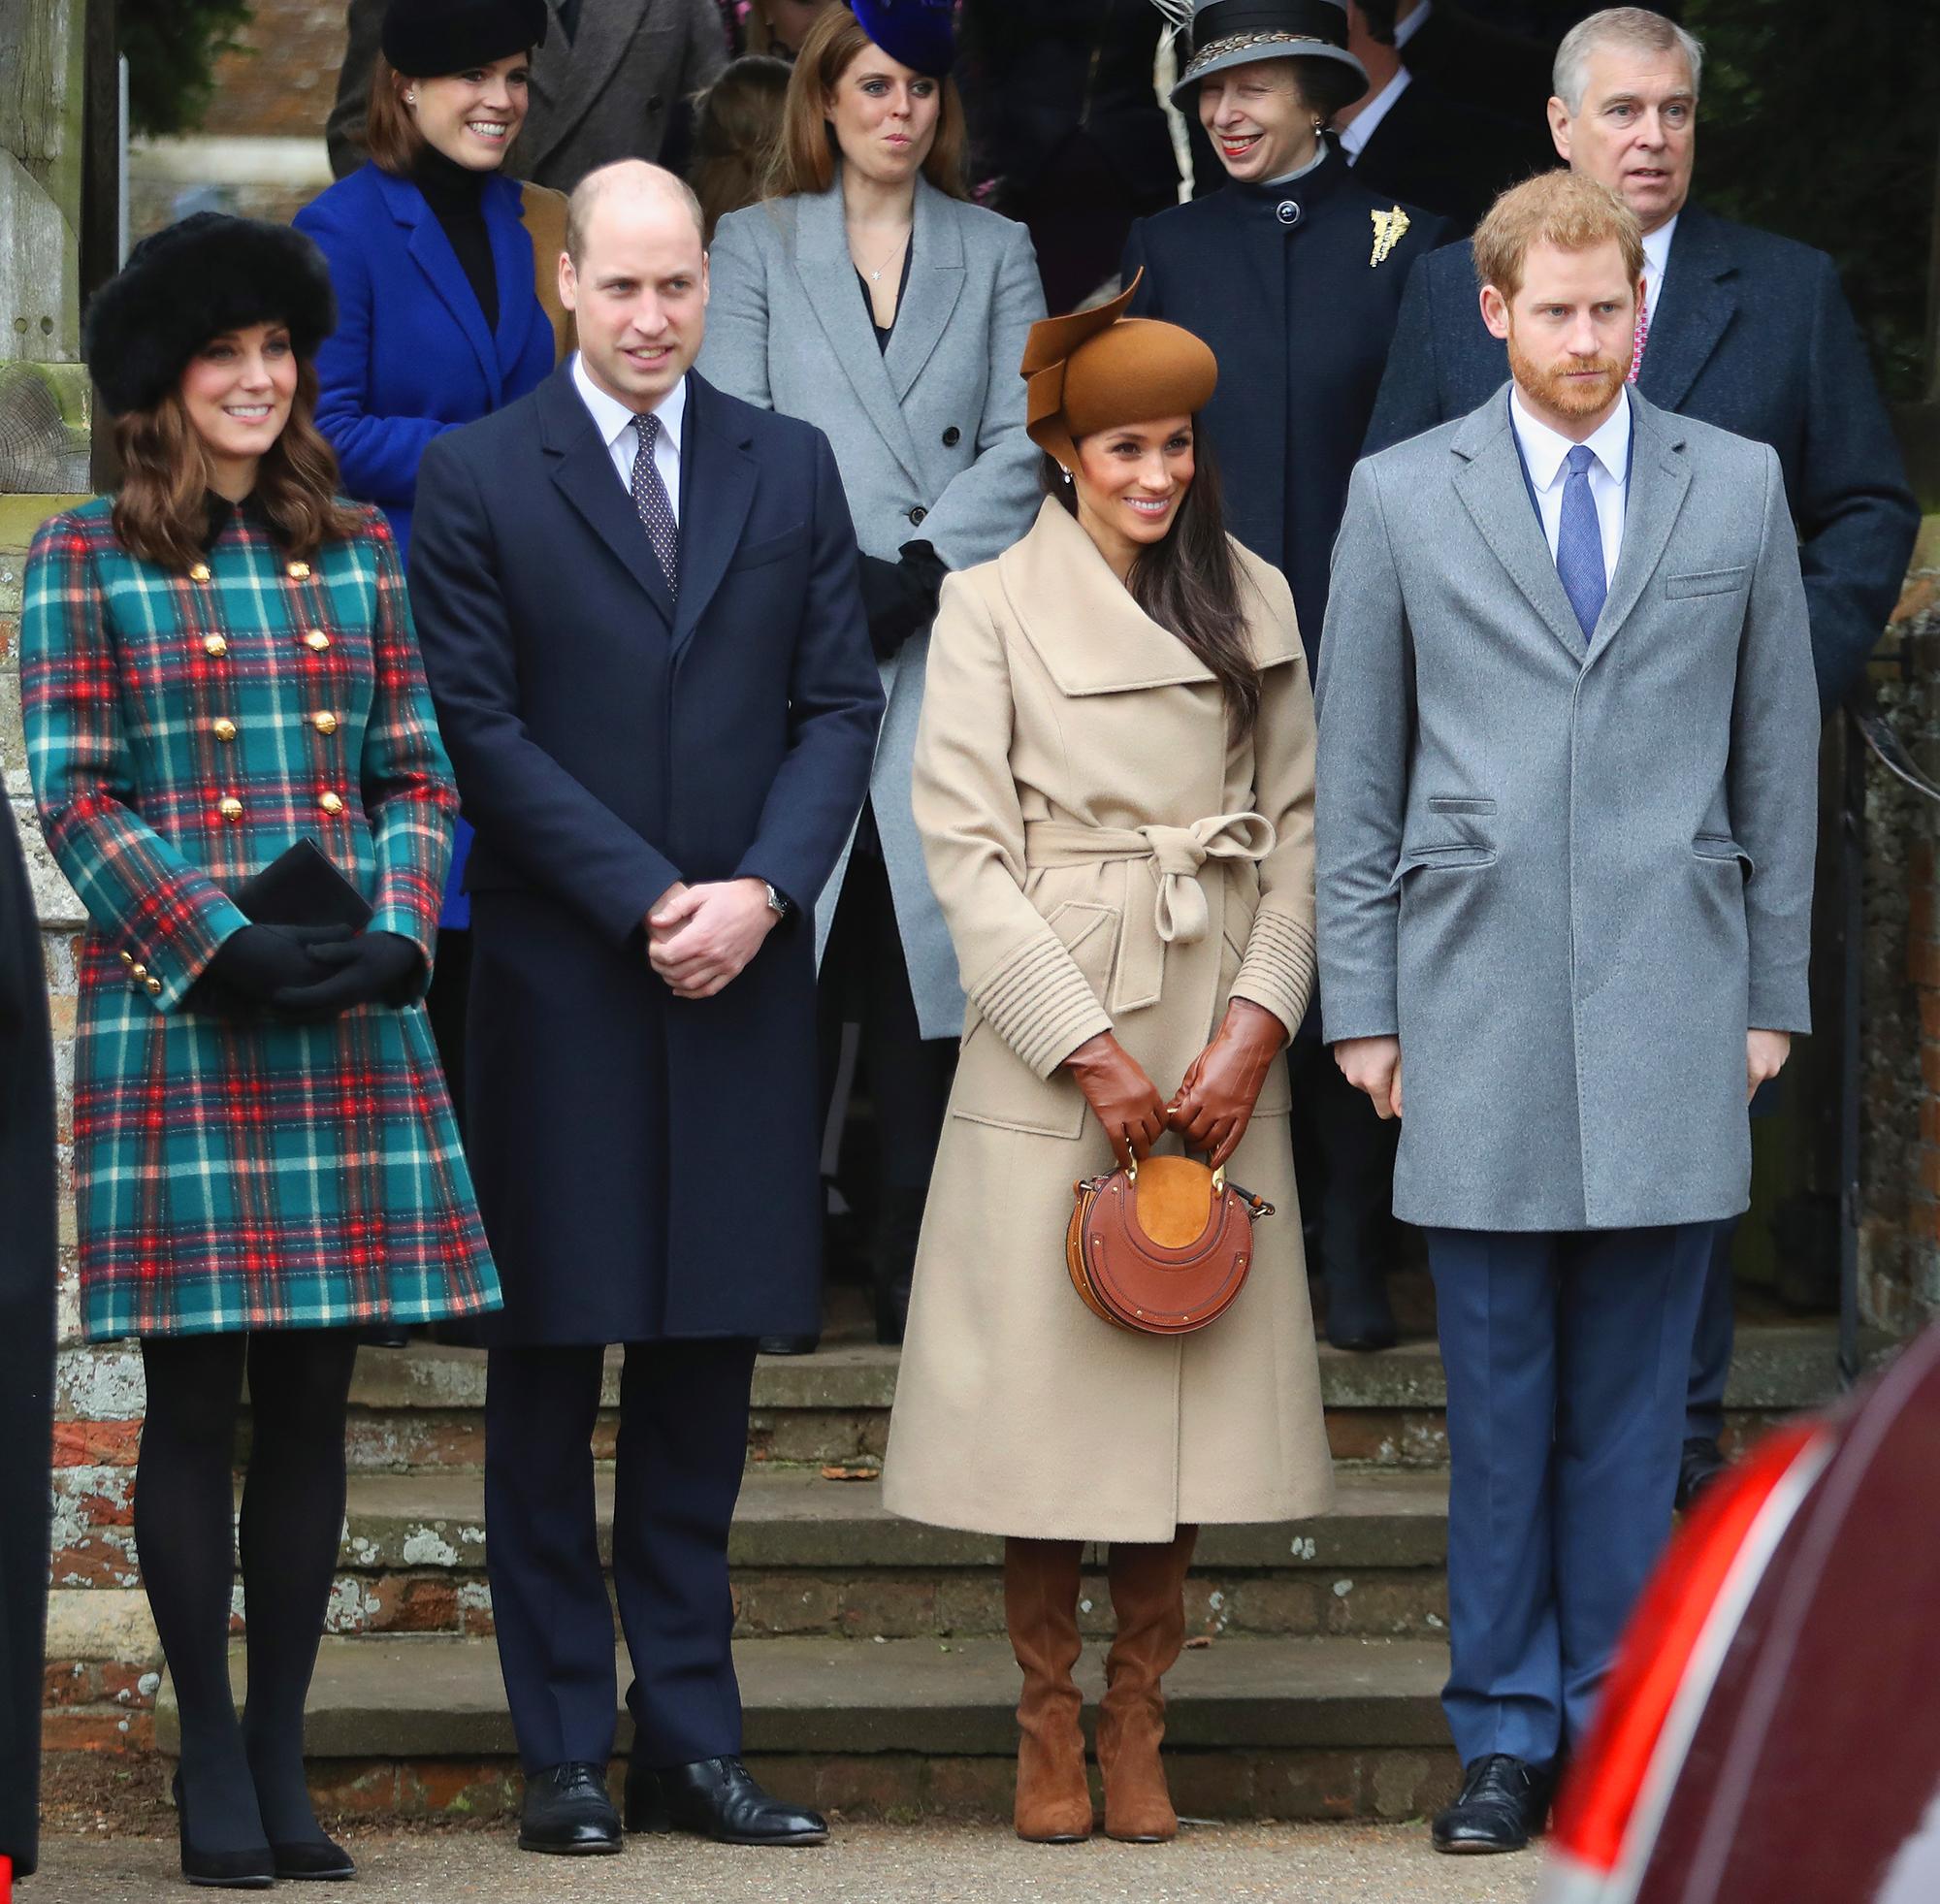 Royal Family Christmas Dinner: Roast Turkey, Pudding, More